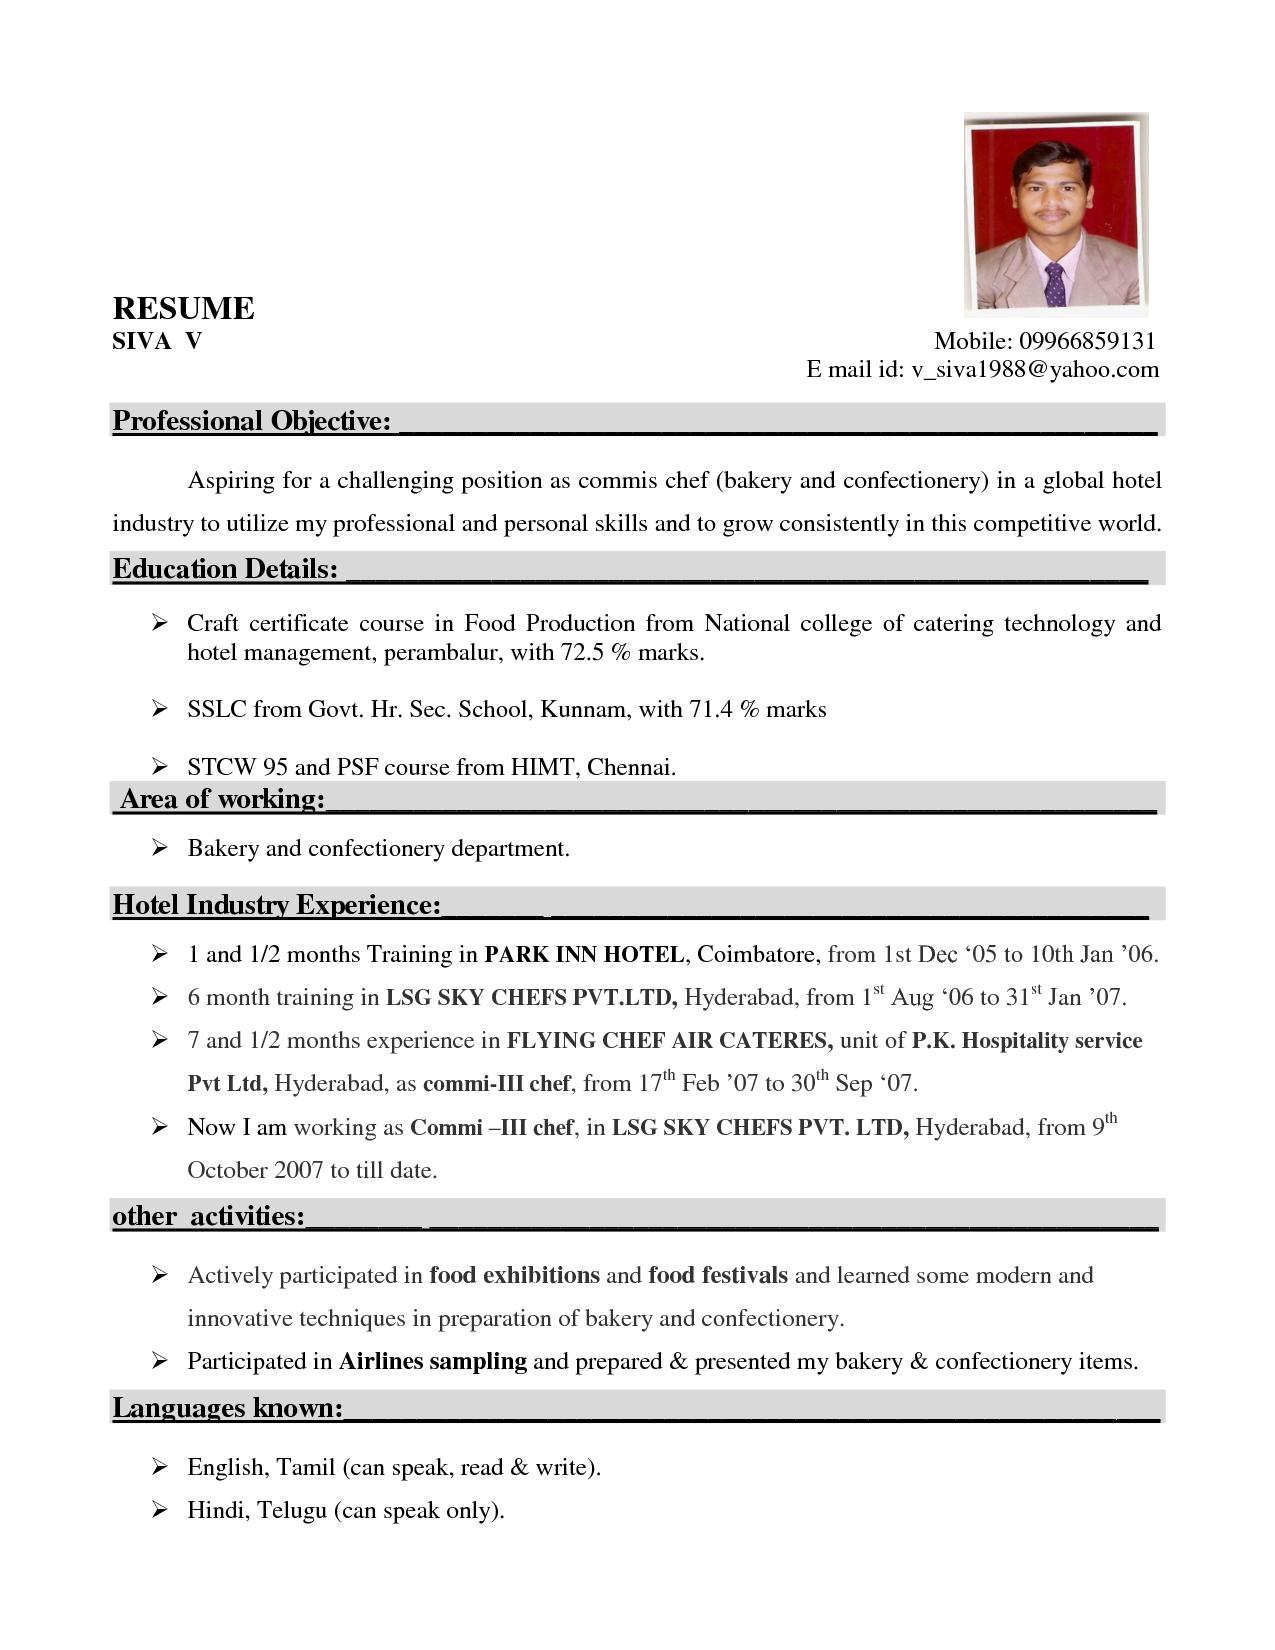 Commis 3 Resume Examples Resume Examples Pinterest Resume Examples